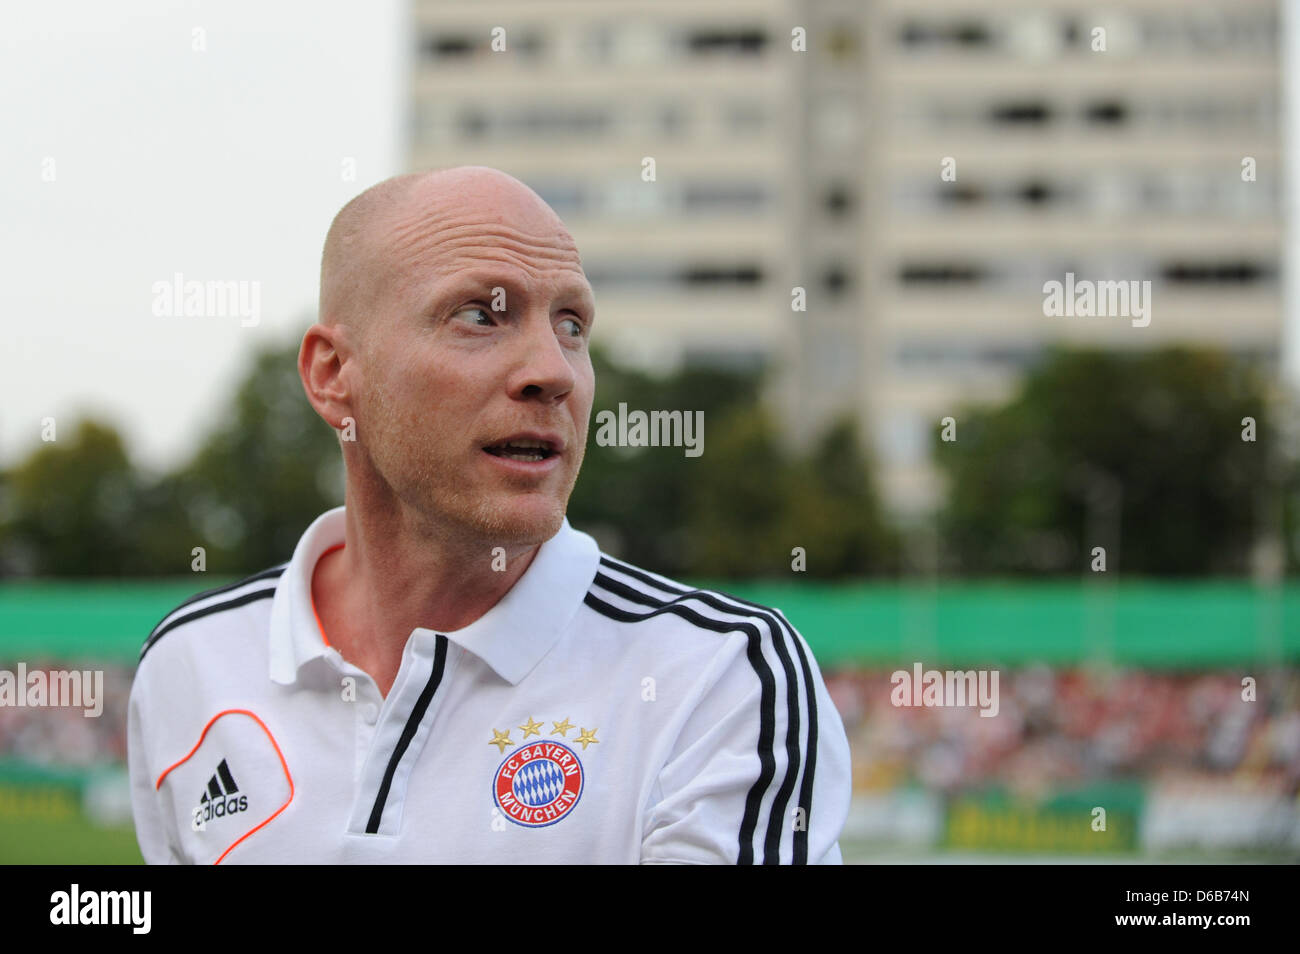 Munich s sports director Matthias Sammer is seen before the DFB